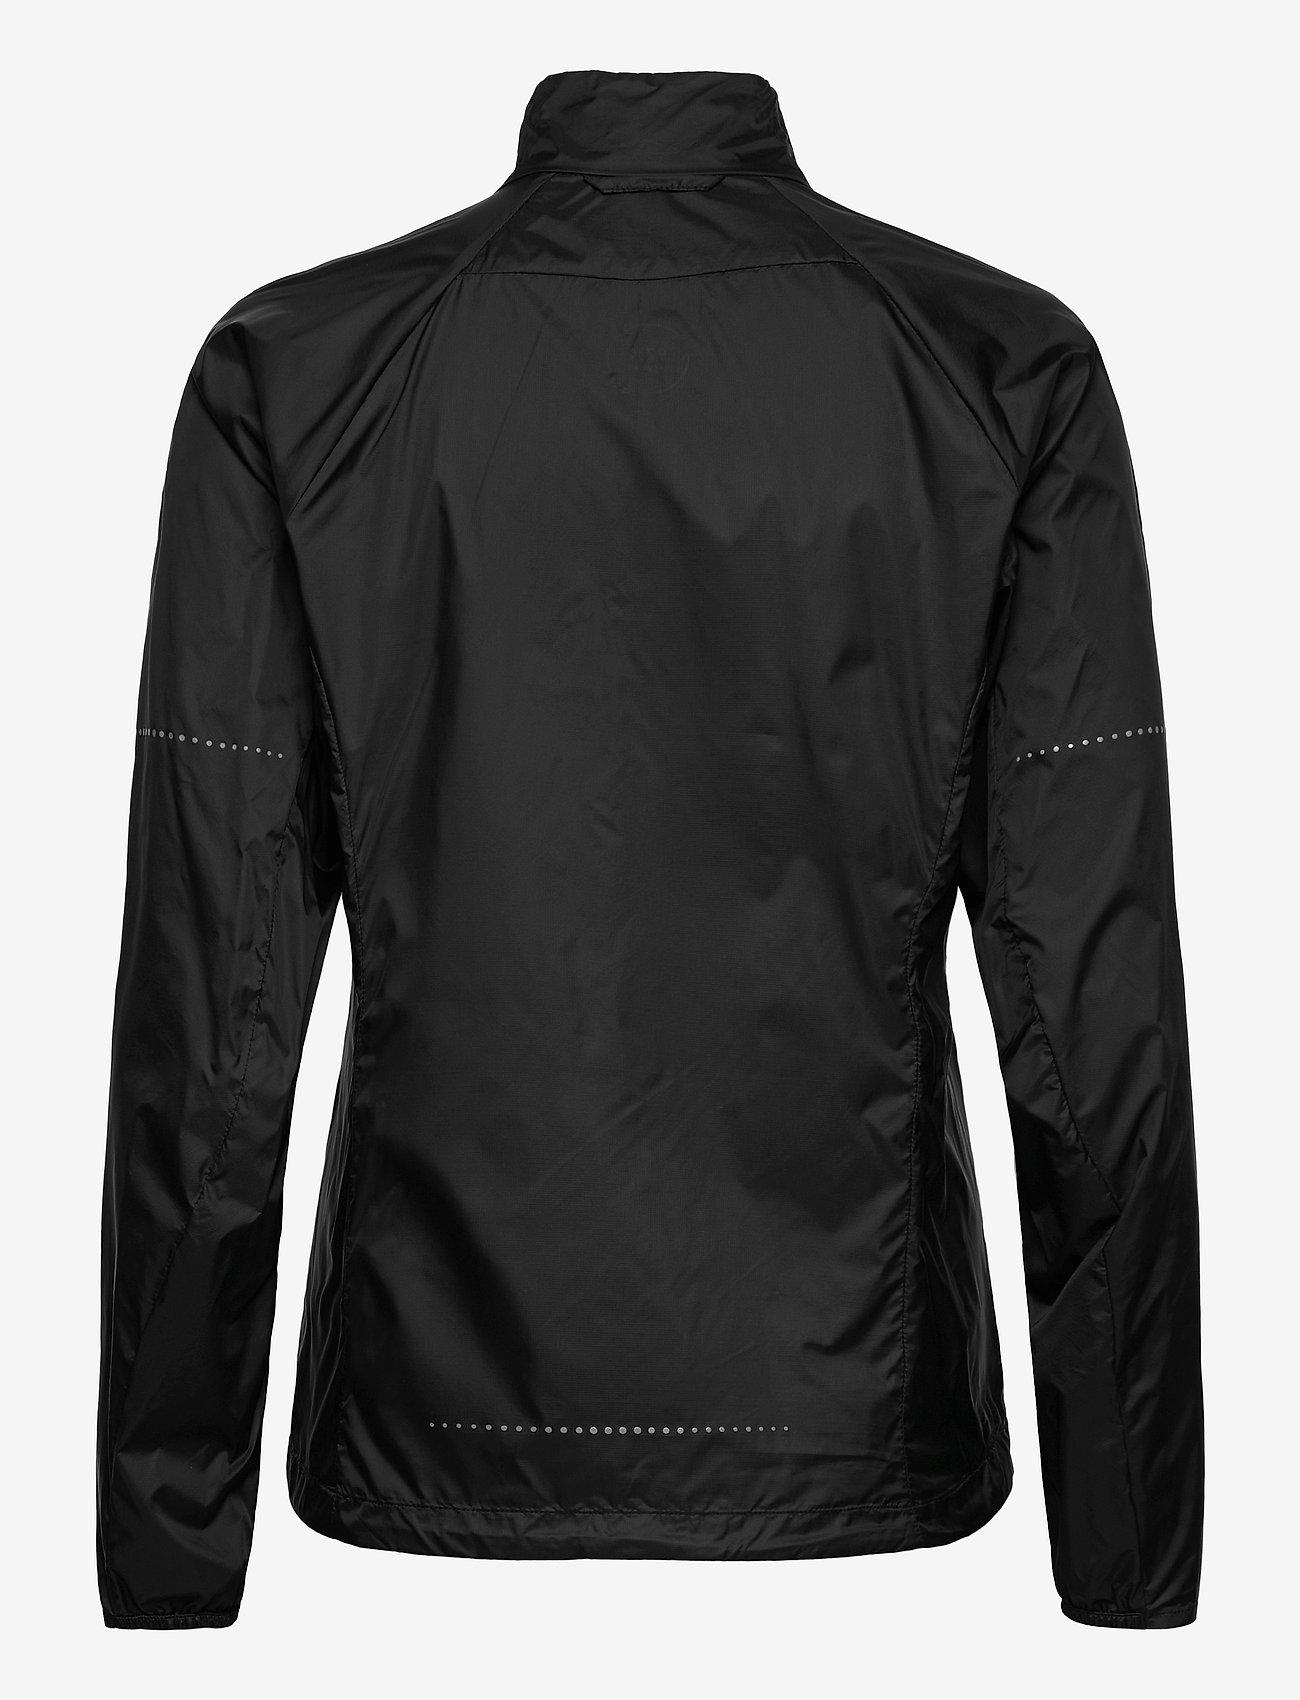 Bergans - Flyen W Jkt - training jackets - black - 1